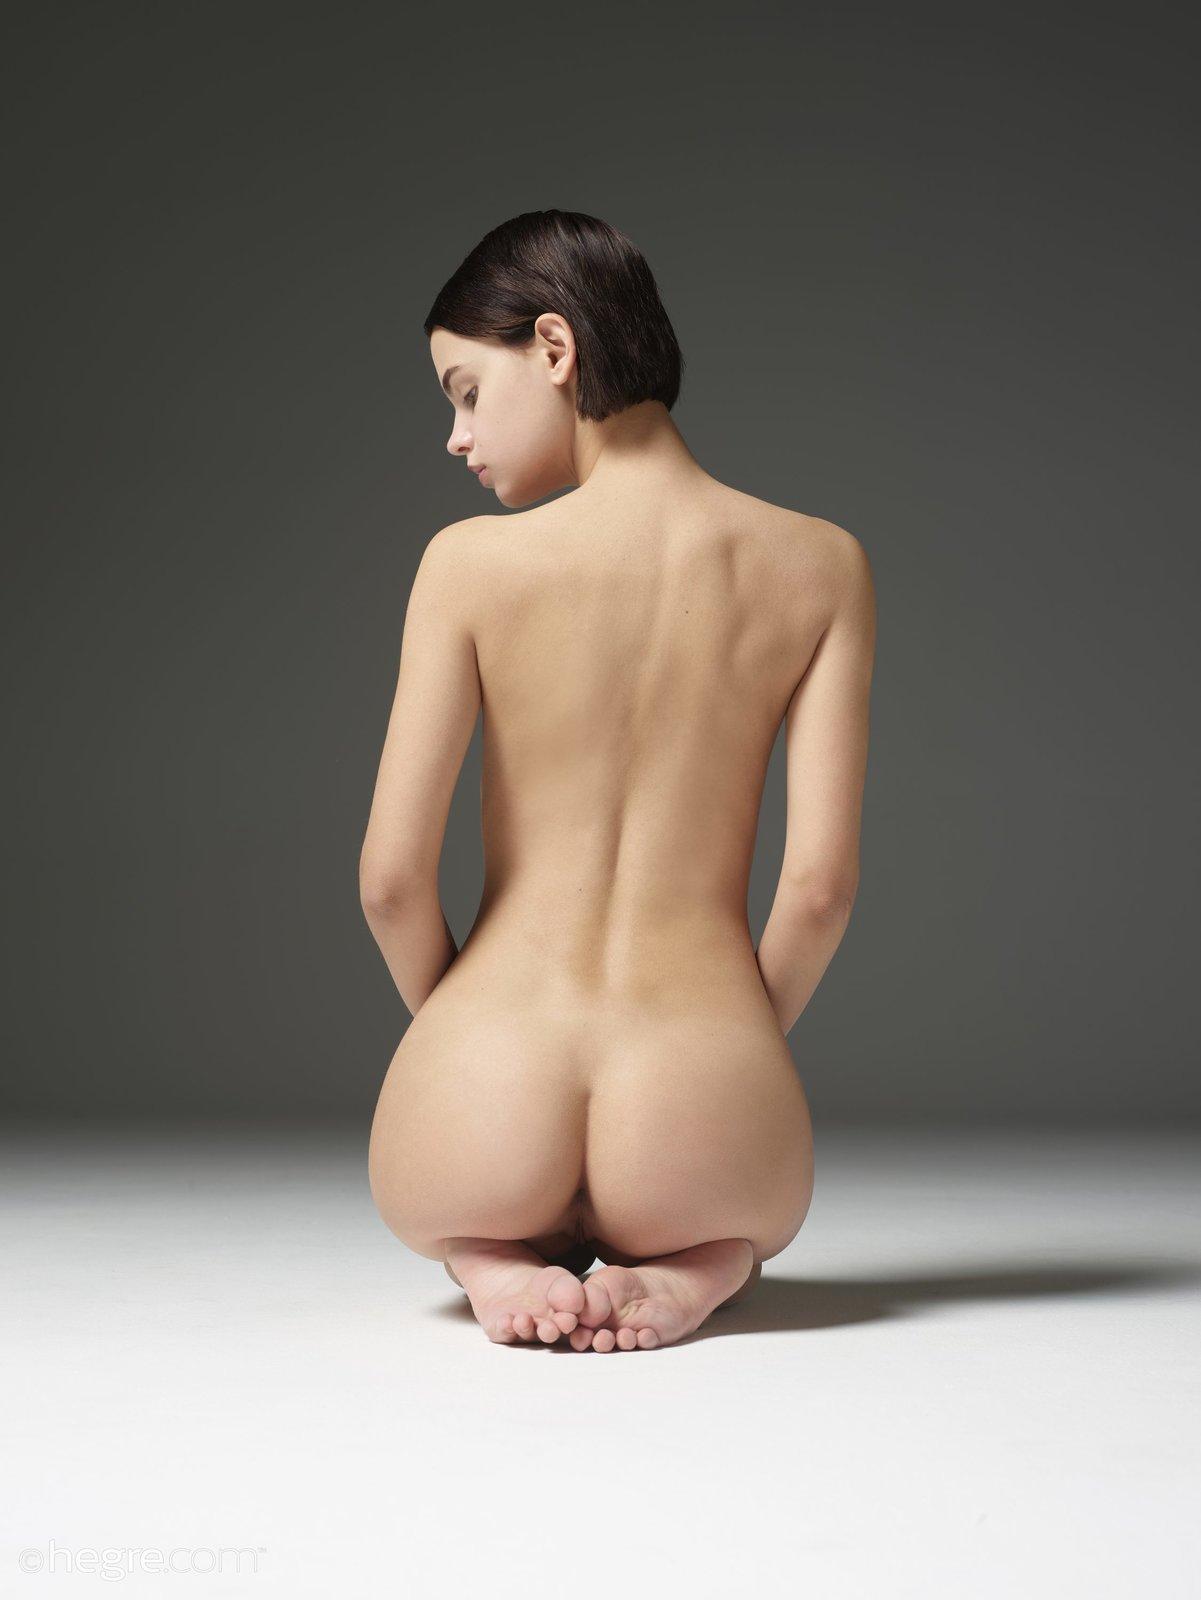 Bikini boob naked nude tit topless wrestling